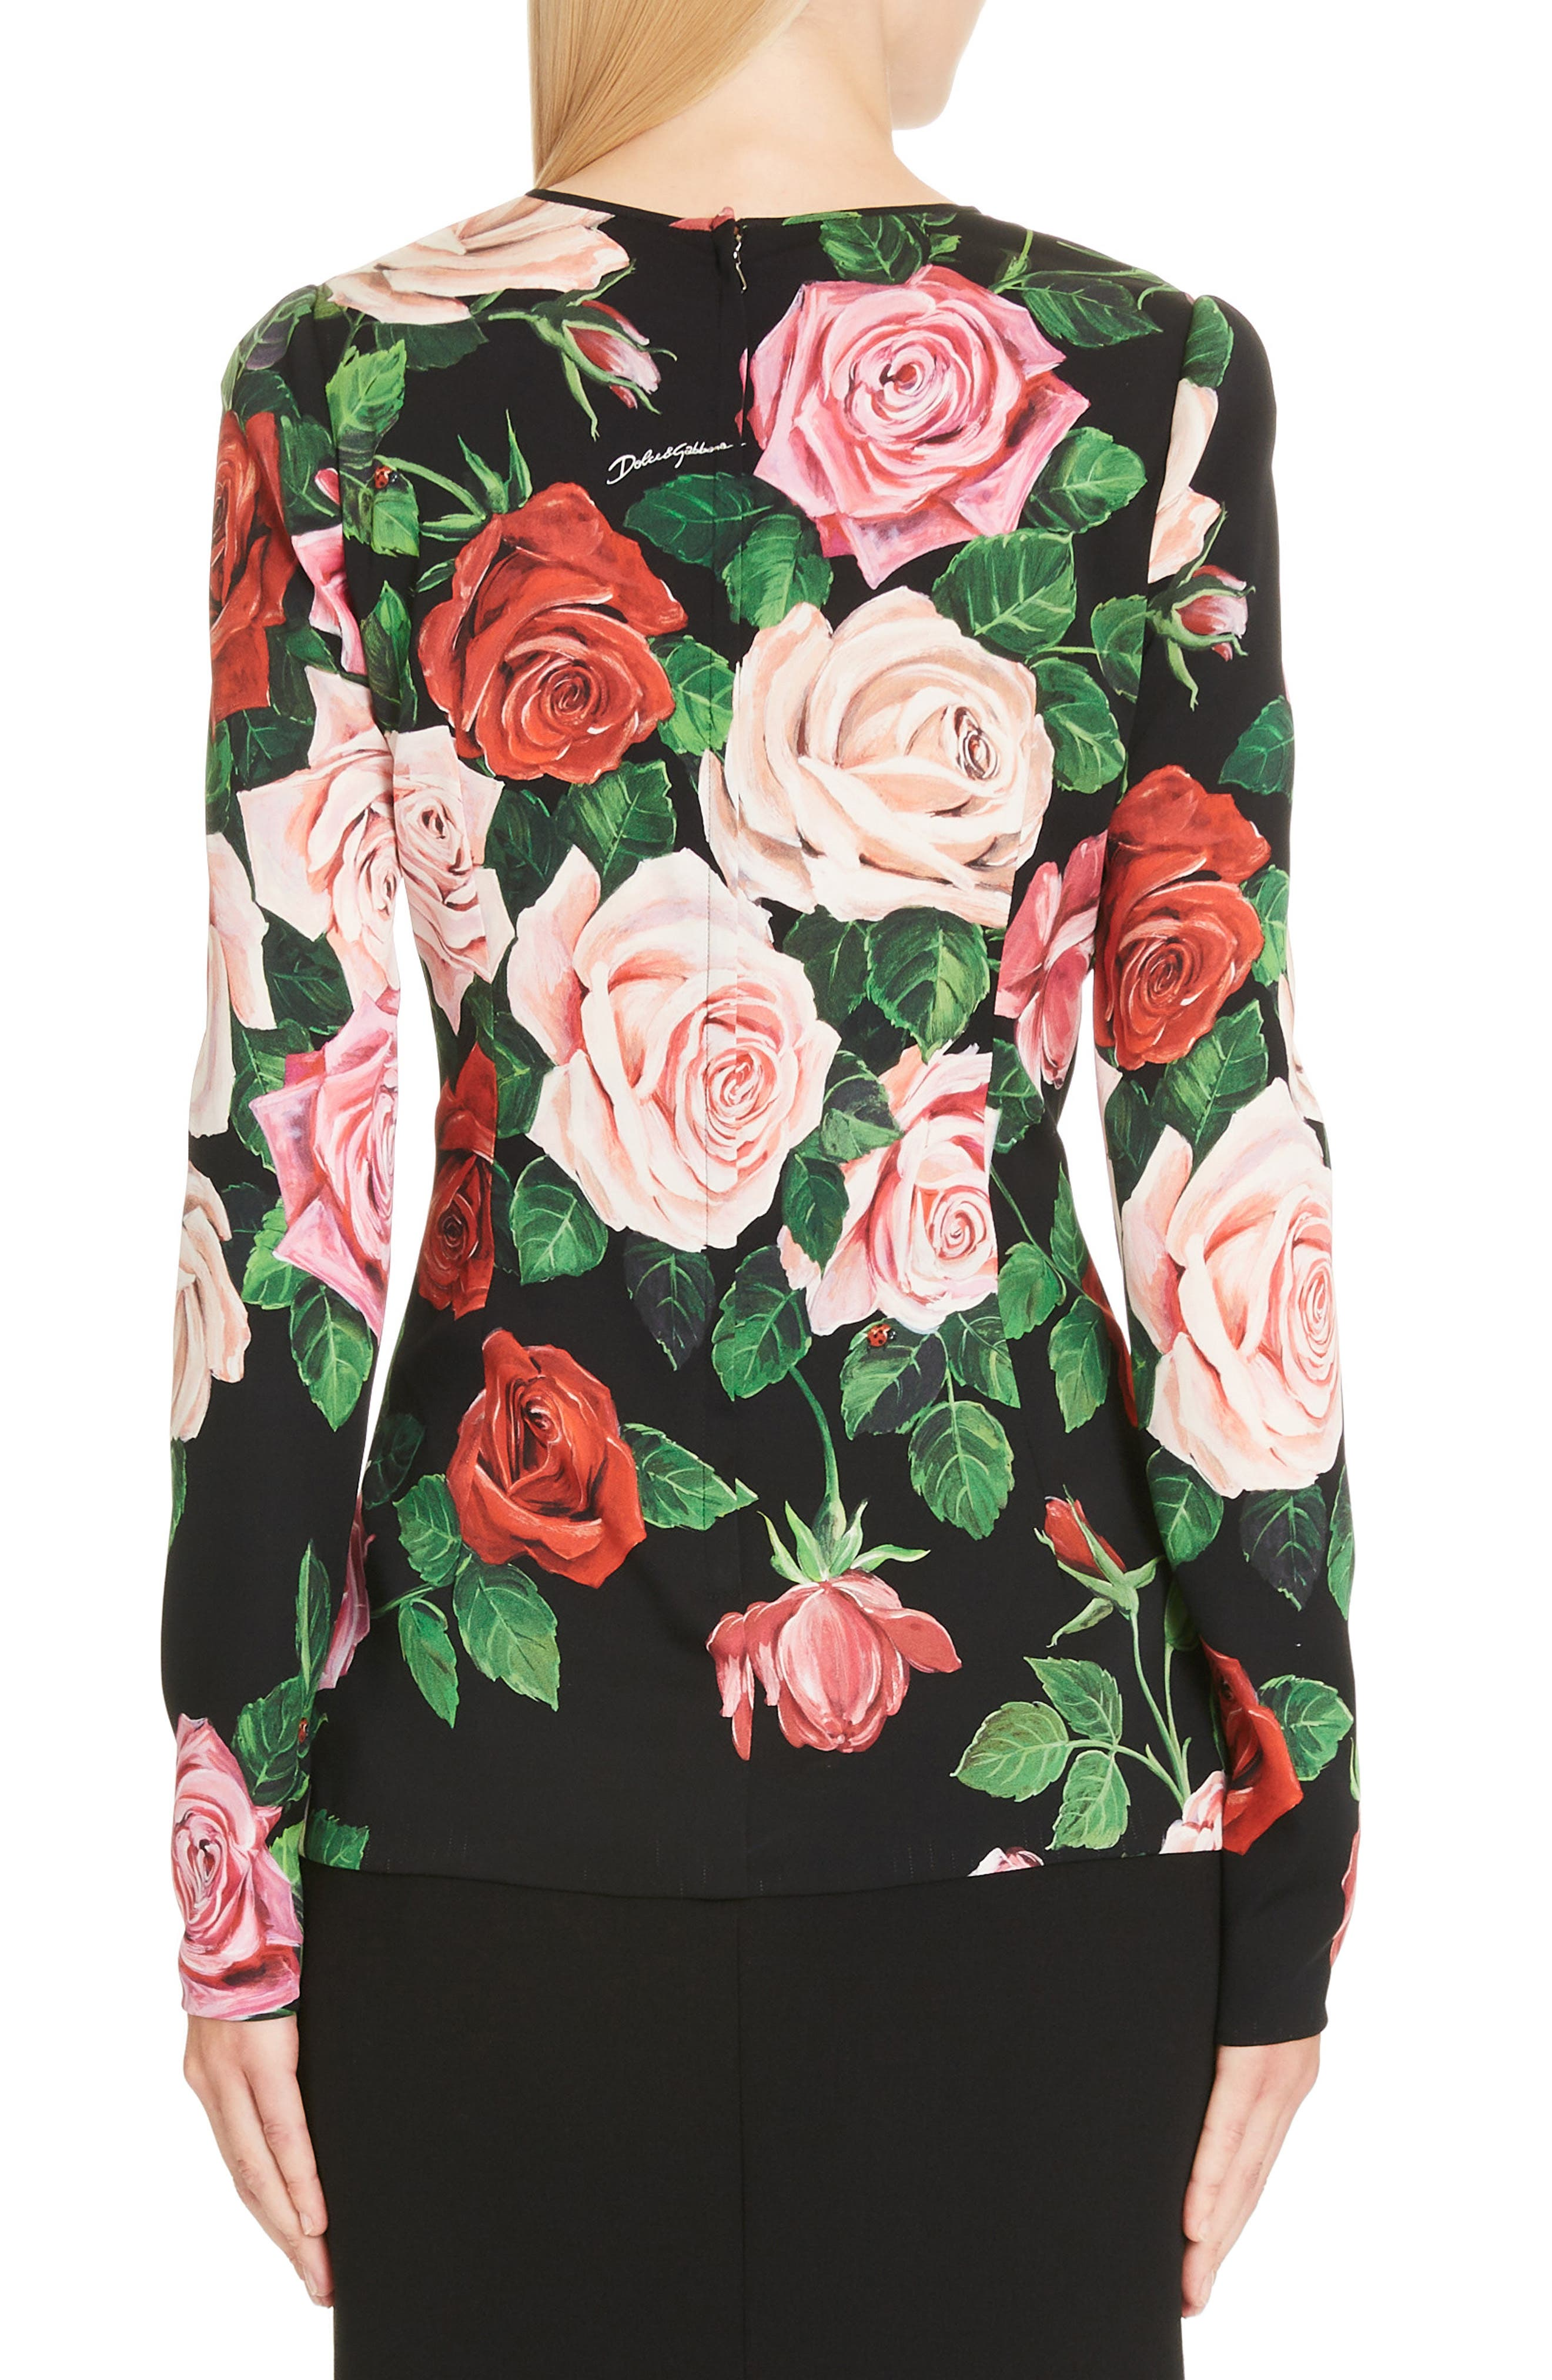 DOLCE&GABBANA, Rose Print Stretch Silk Top, Alternate thumbnail 2, color, BLACK ROSE